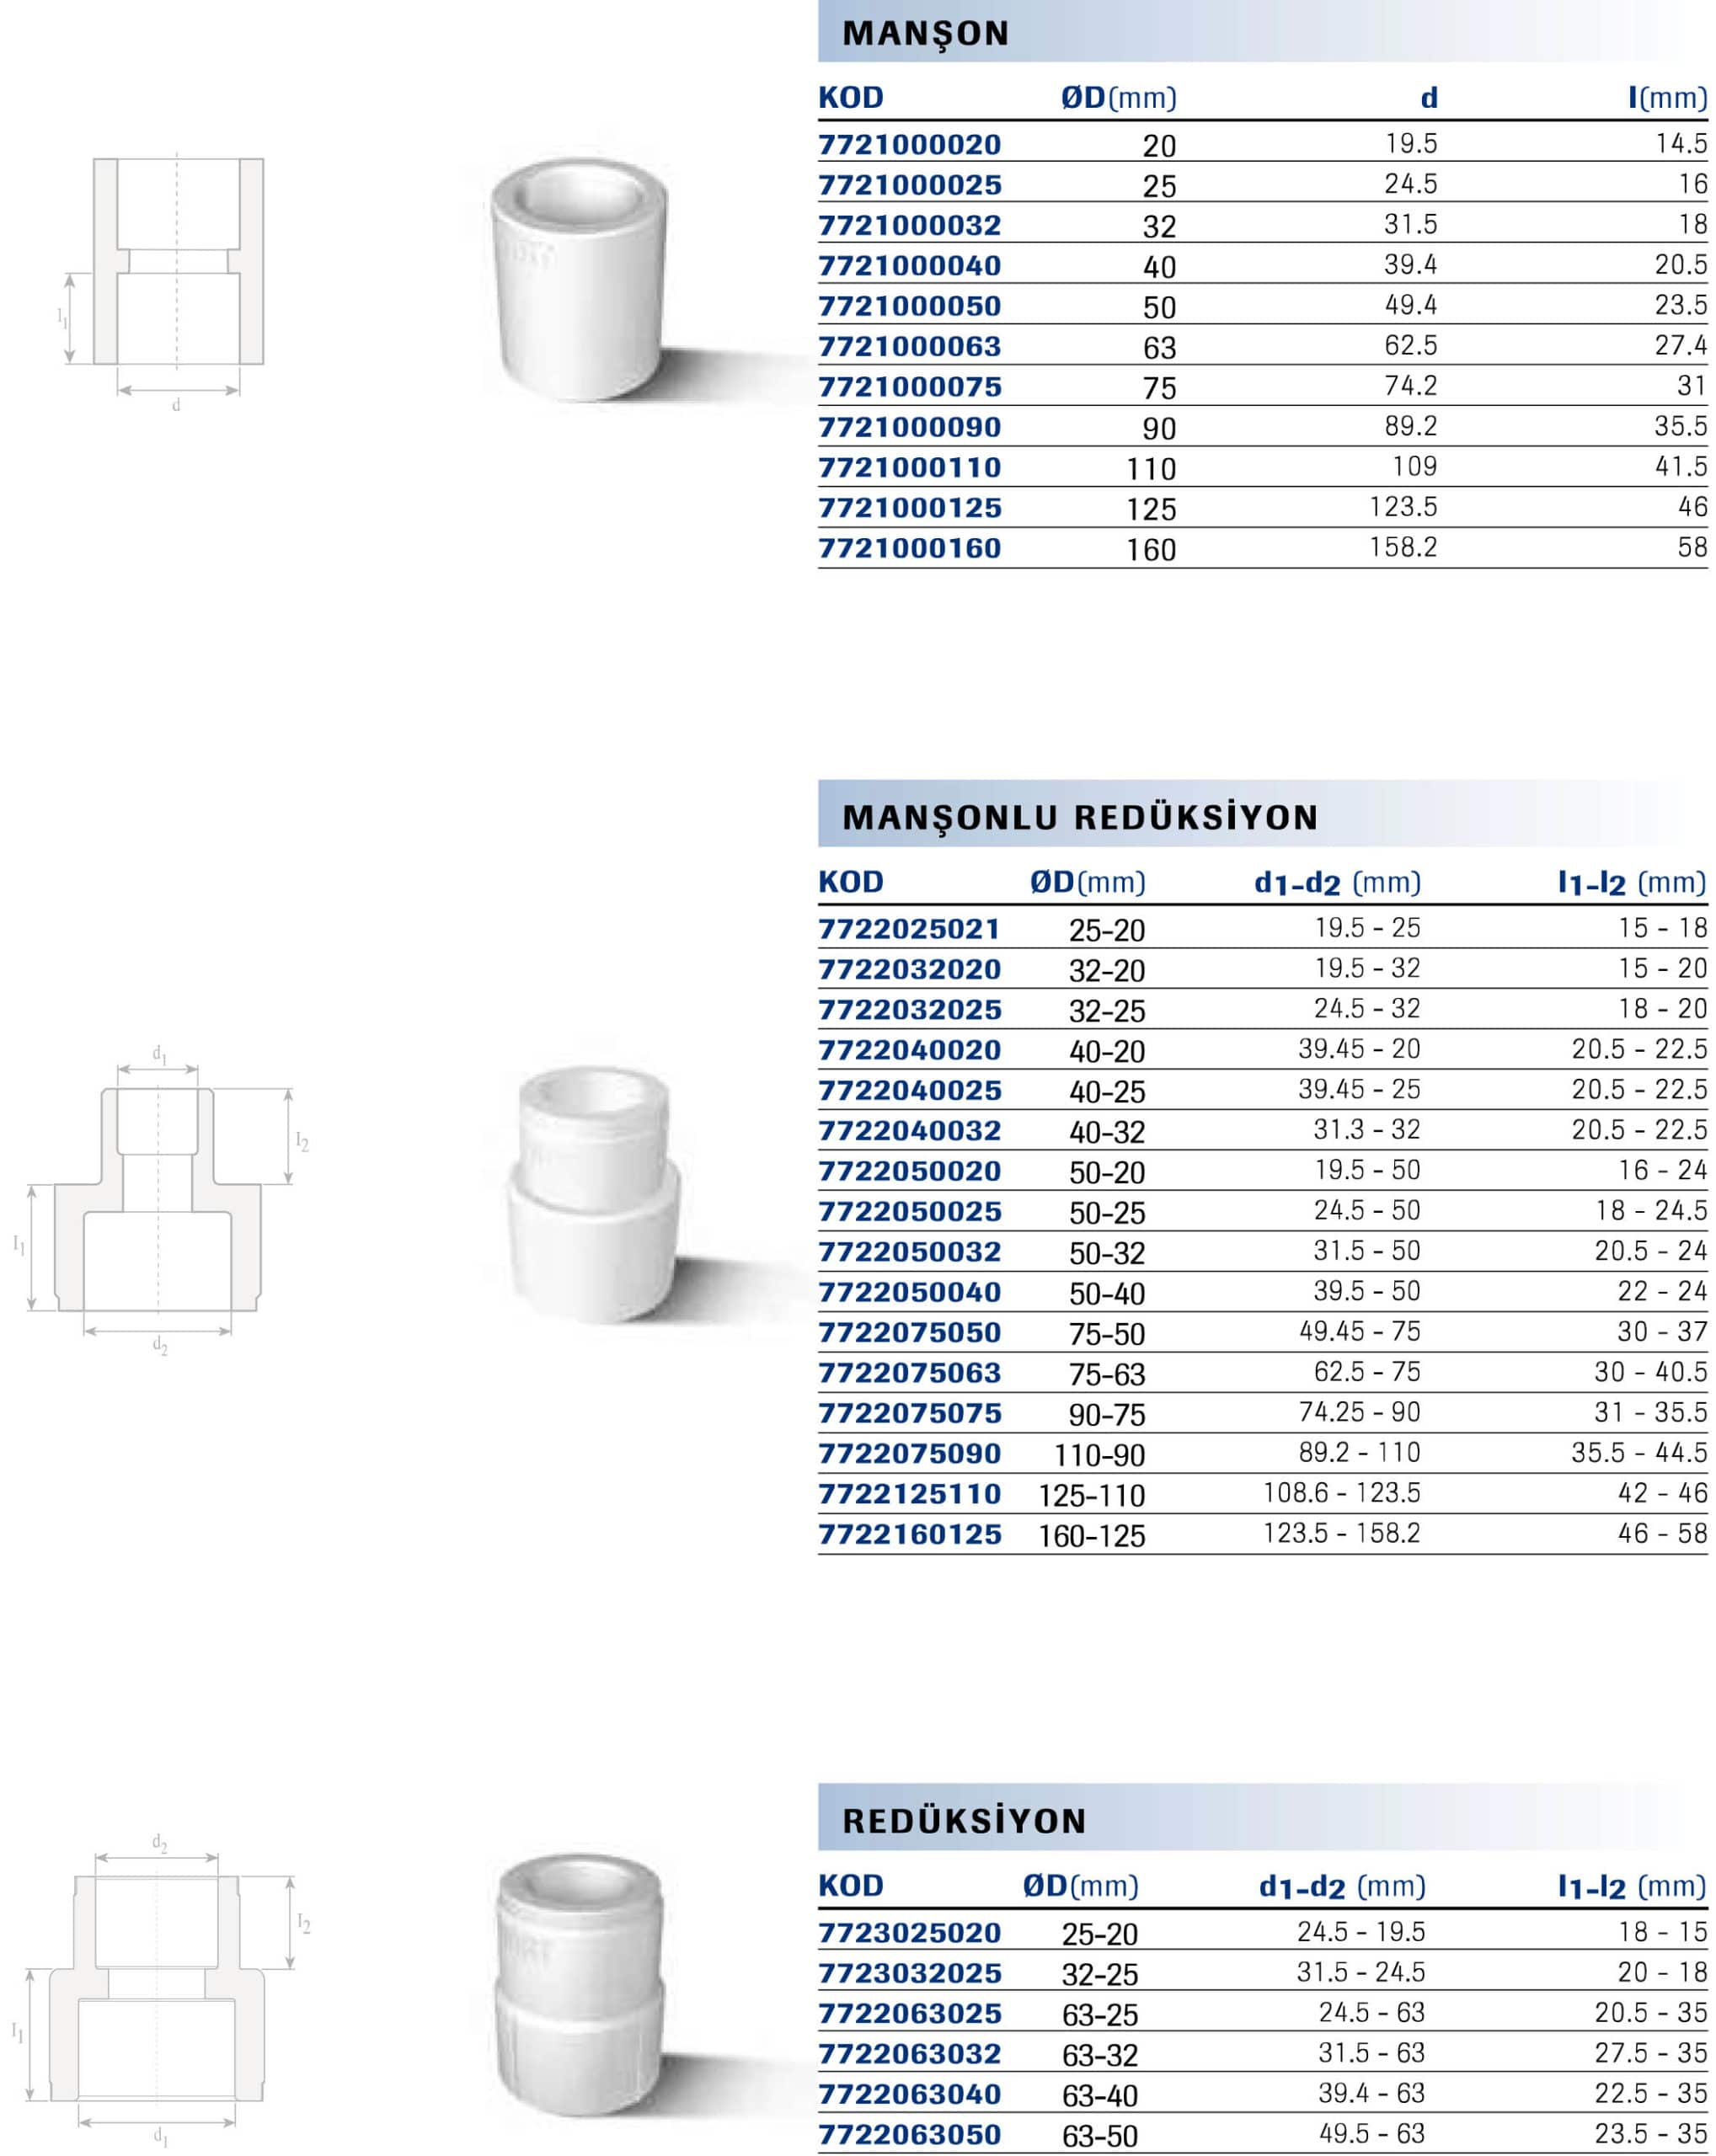 inc mm degerleri 9 scaled